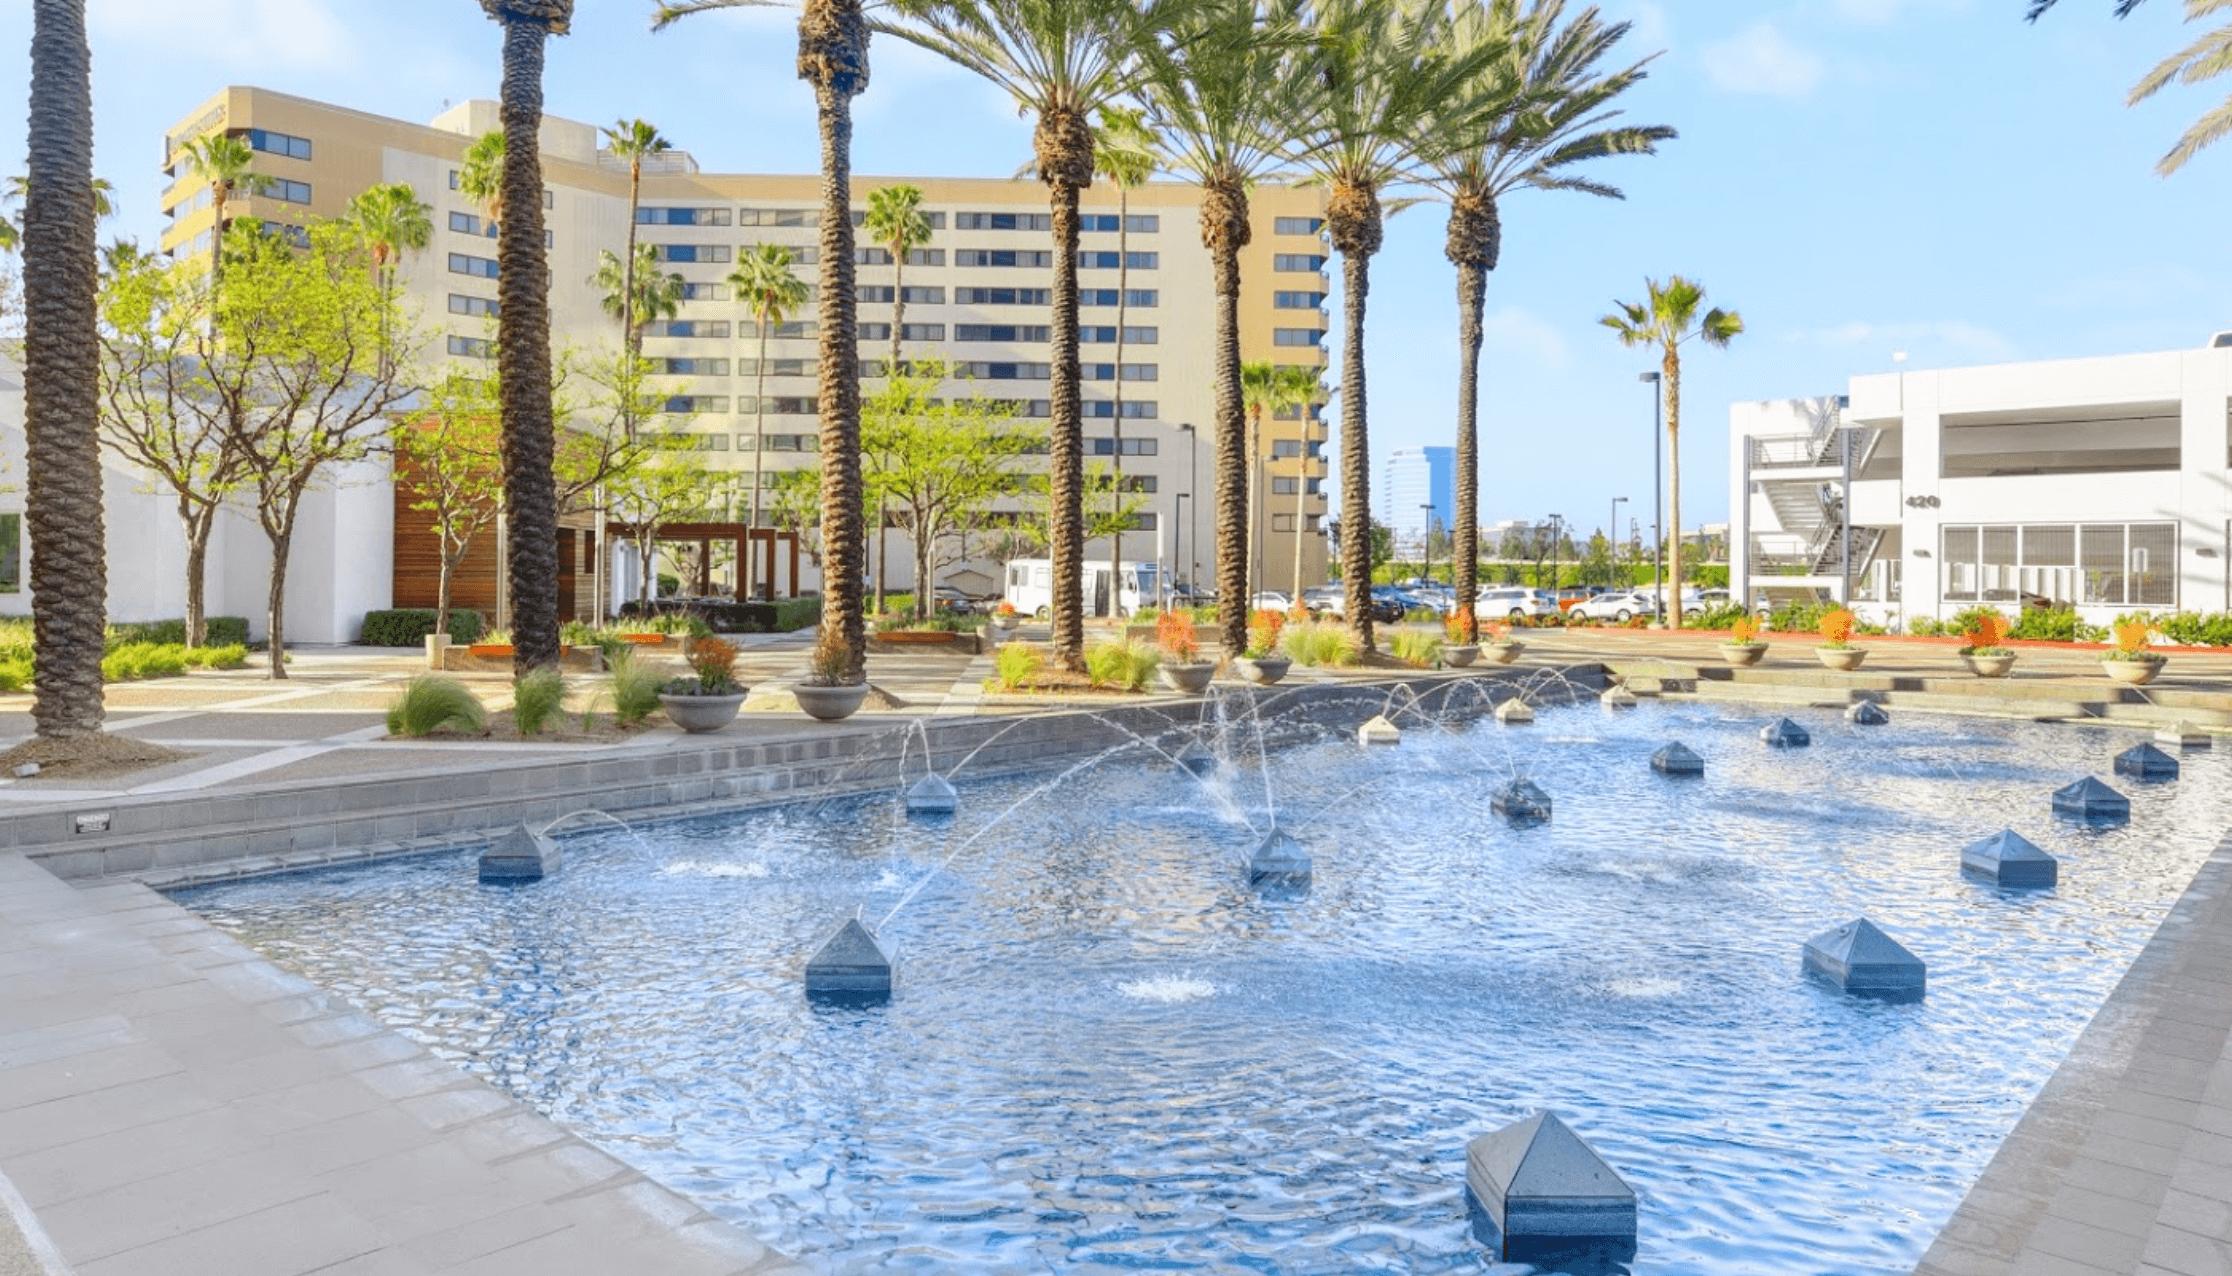 Embassy Suites Anaheim Orange fountain outside